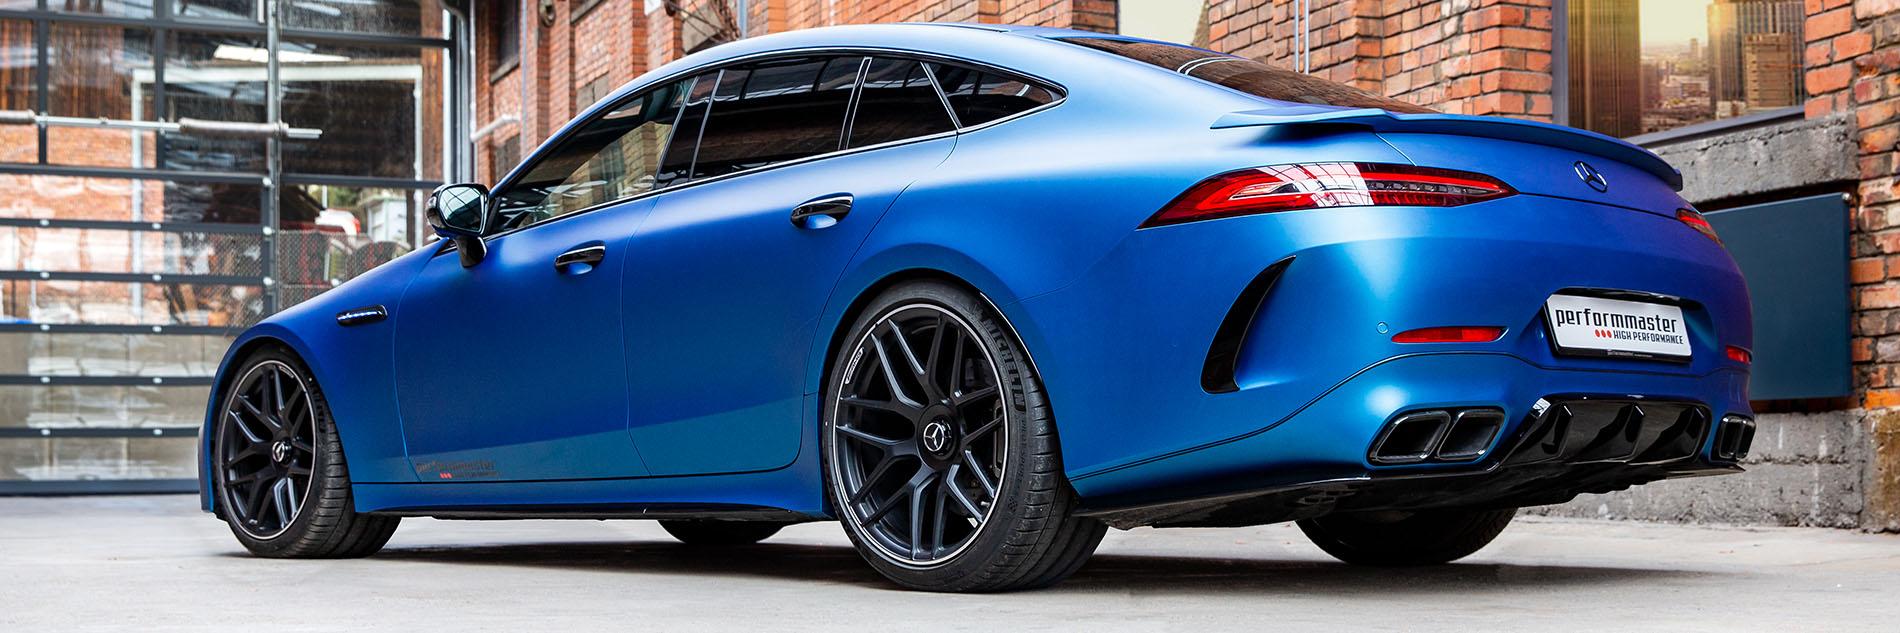 Aerodynamik Optimierung Mercedes-AMG GT